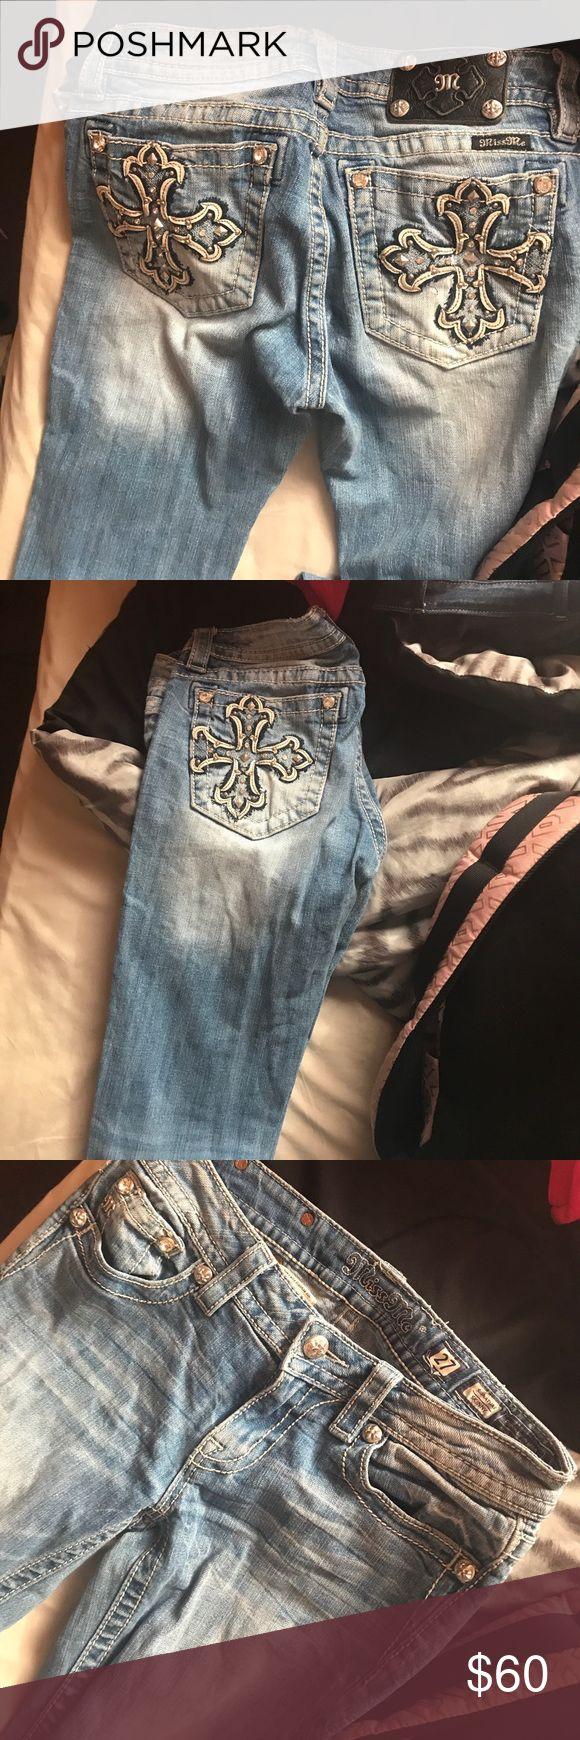 Miss me skinny jeans Light wash Miss me skinny jeans Size 27 Miss Me Jeans Skinny